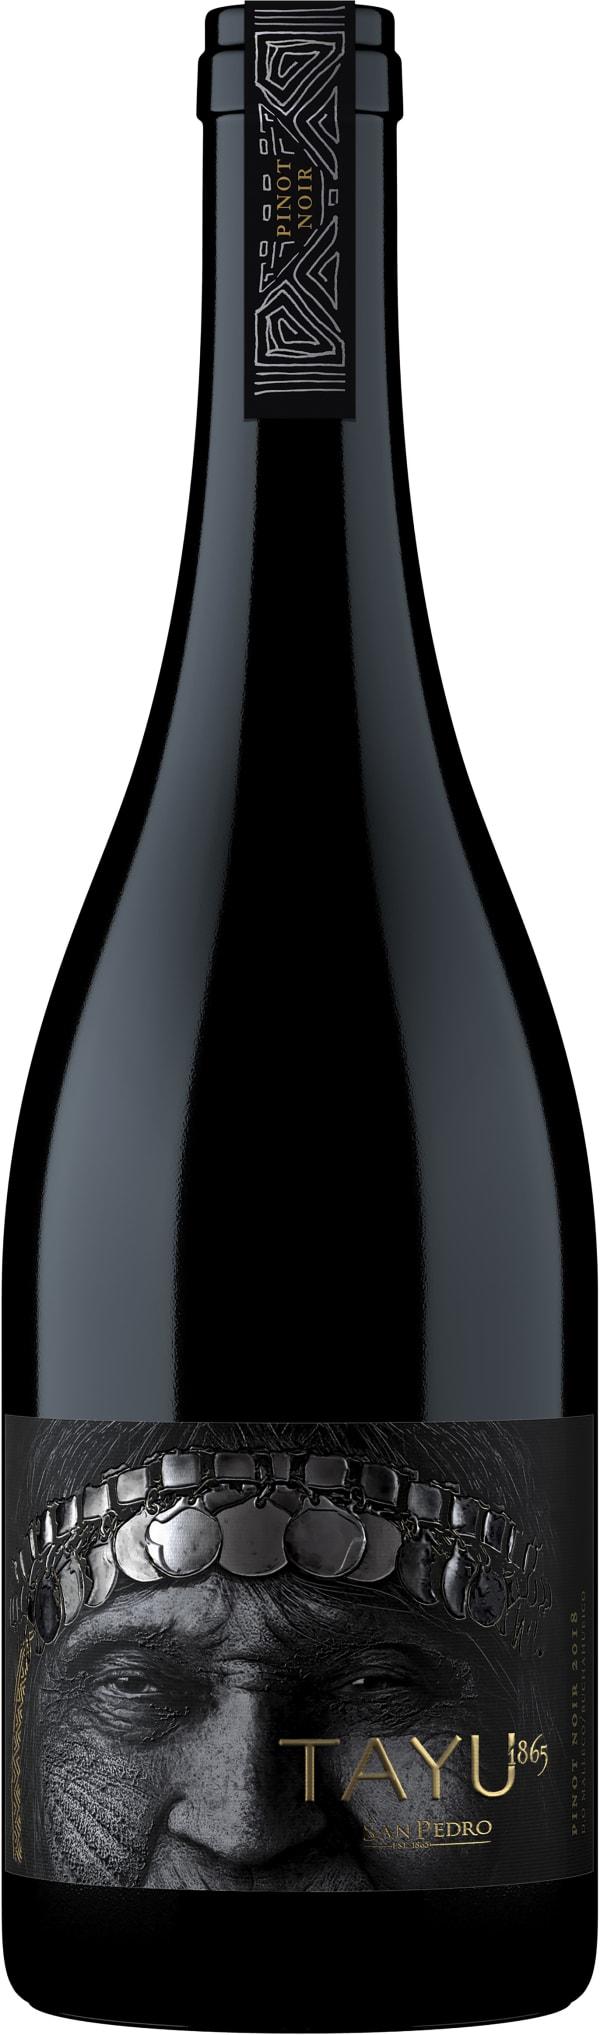 Tayu 1865 Pinot Noir 2019